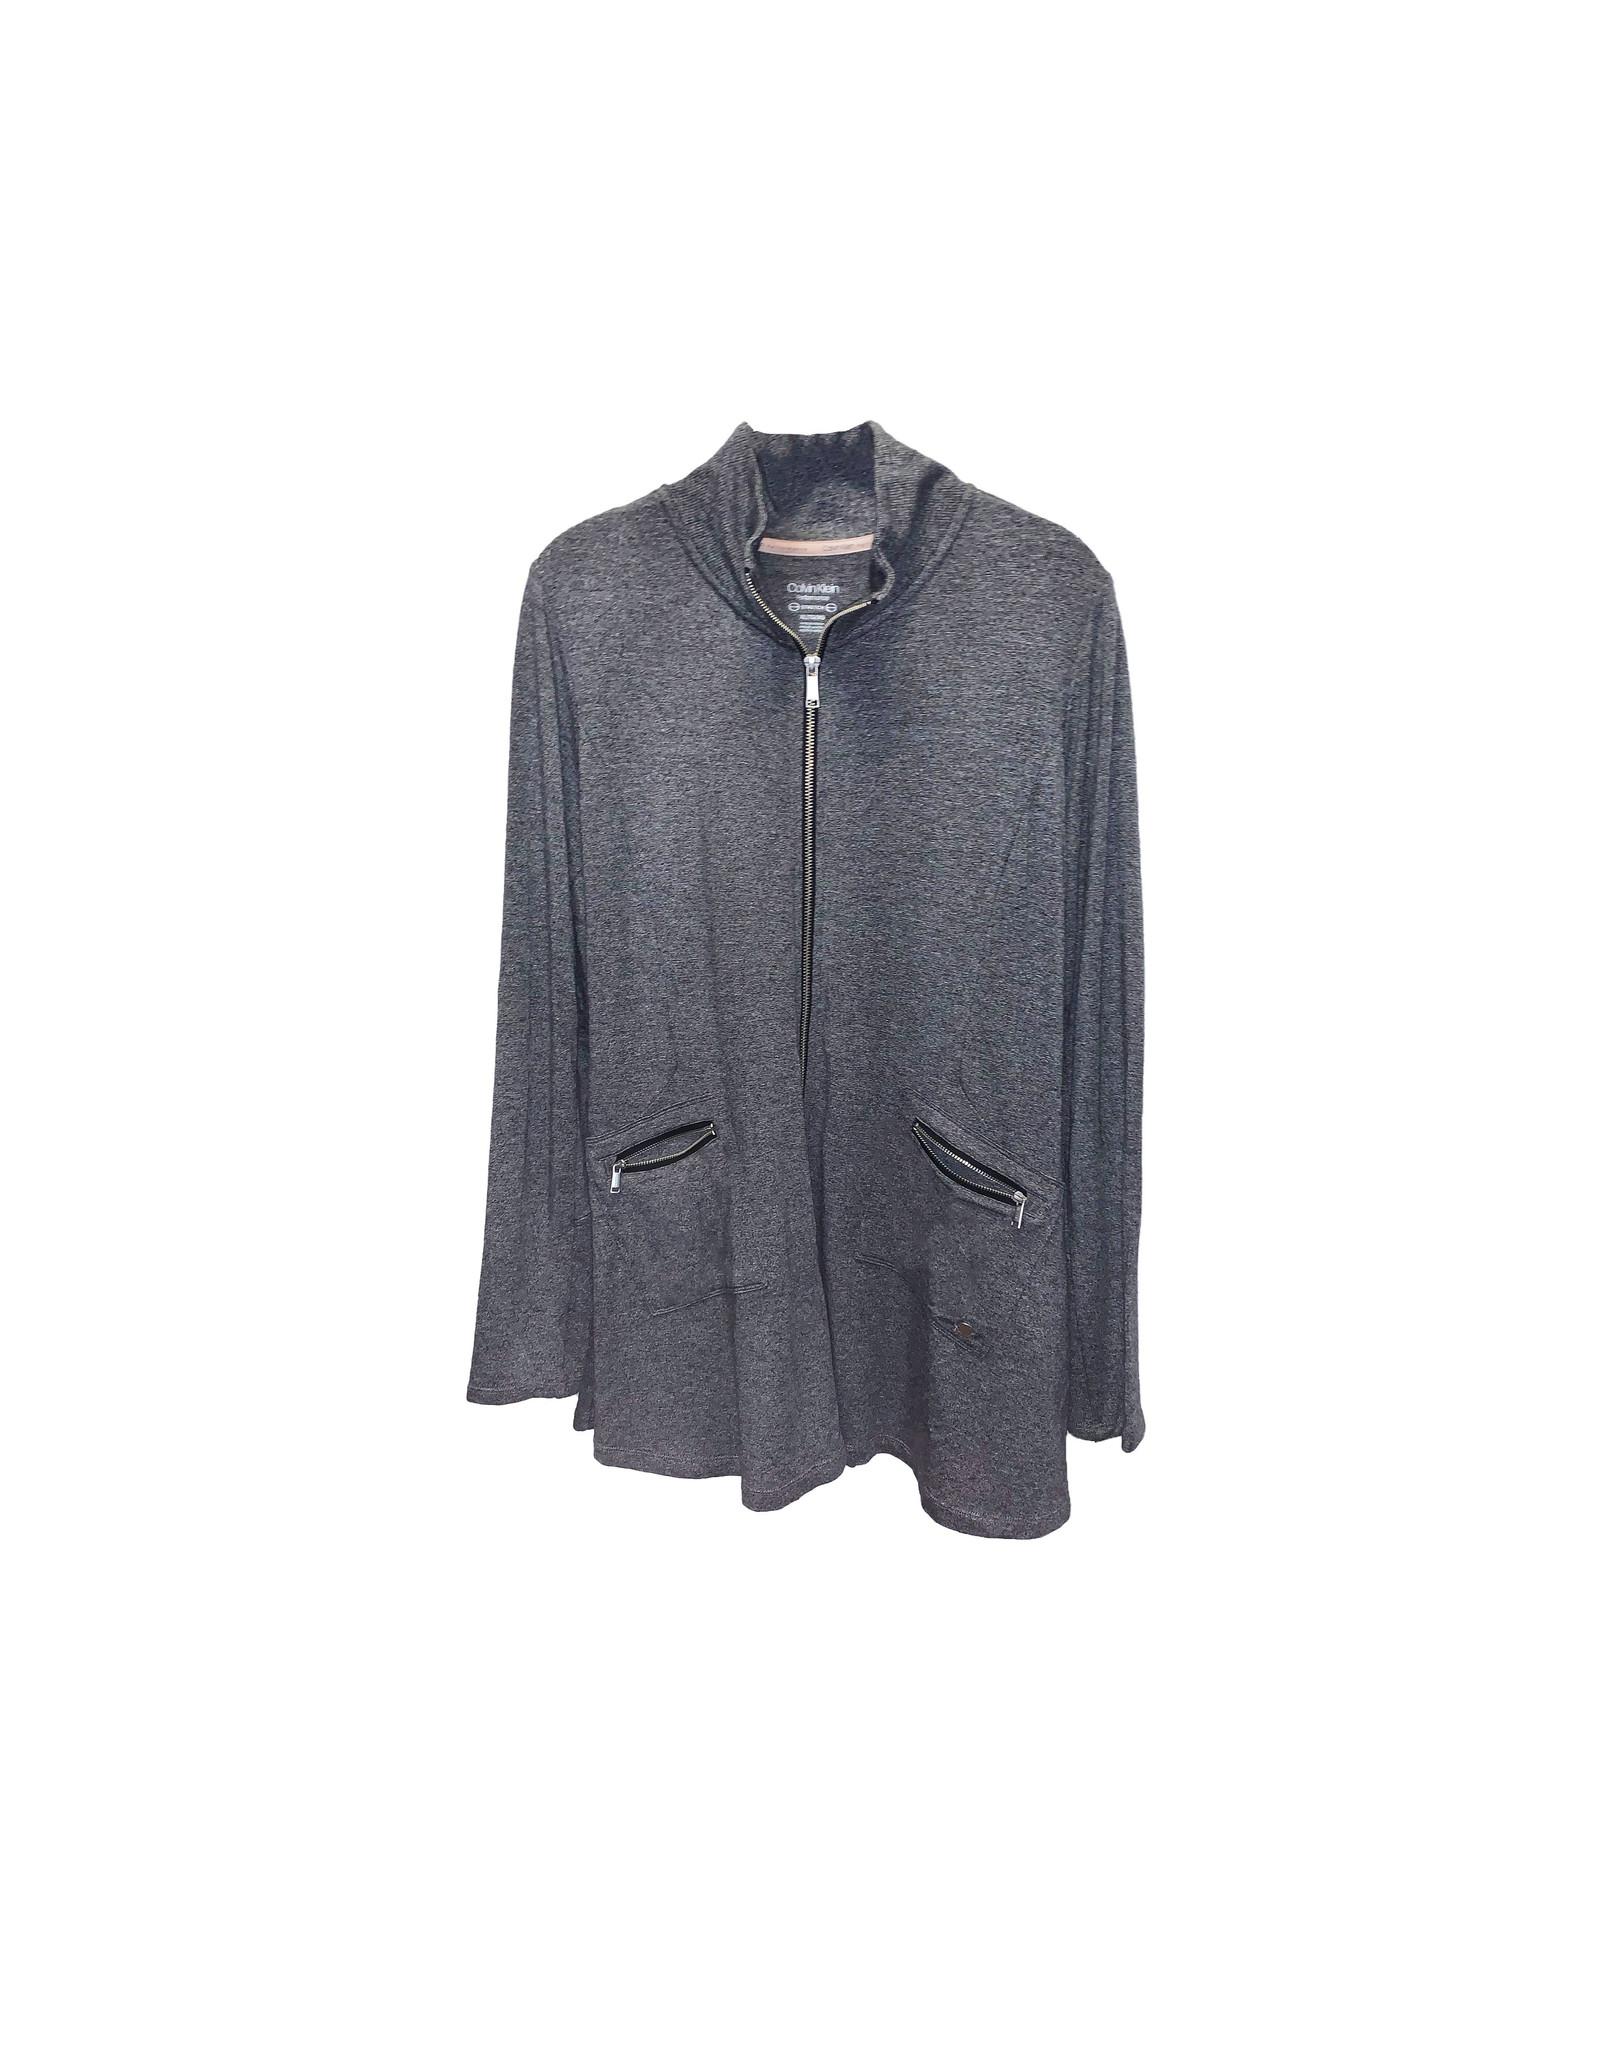 Calvin Klein Calvin klein  Full Zip Sweatshirt